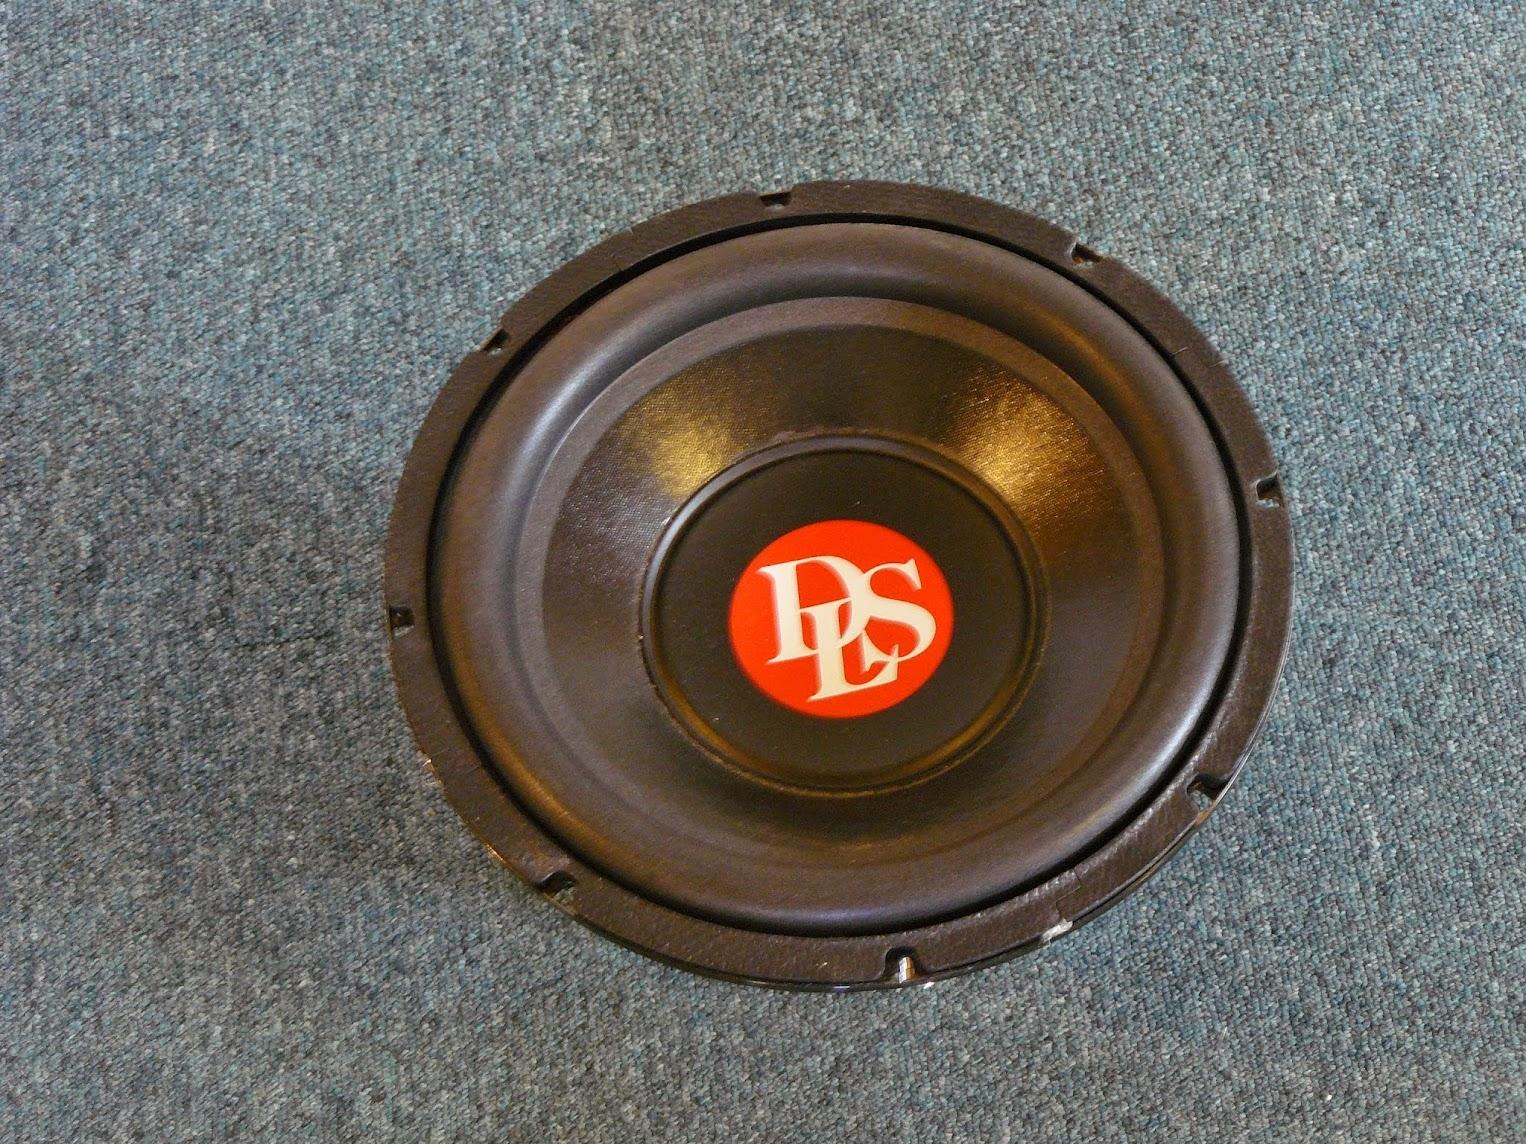 fs dls classic oa12 free air subwoofer car audio. Black Bedroom Furniture Sets. Home Design Ideas